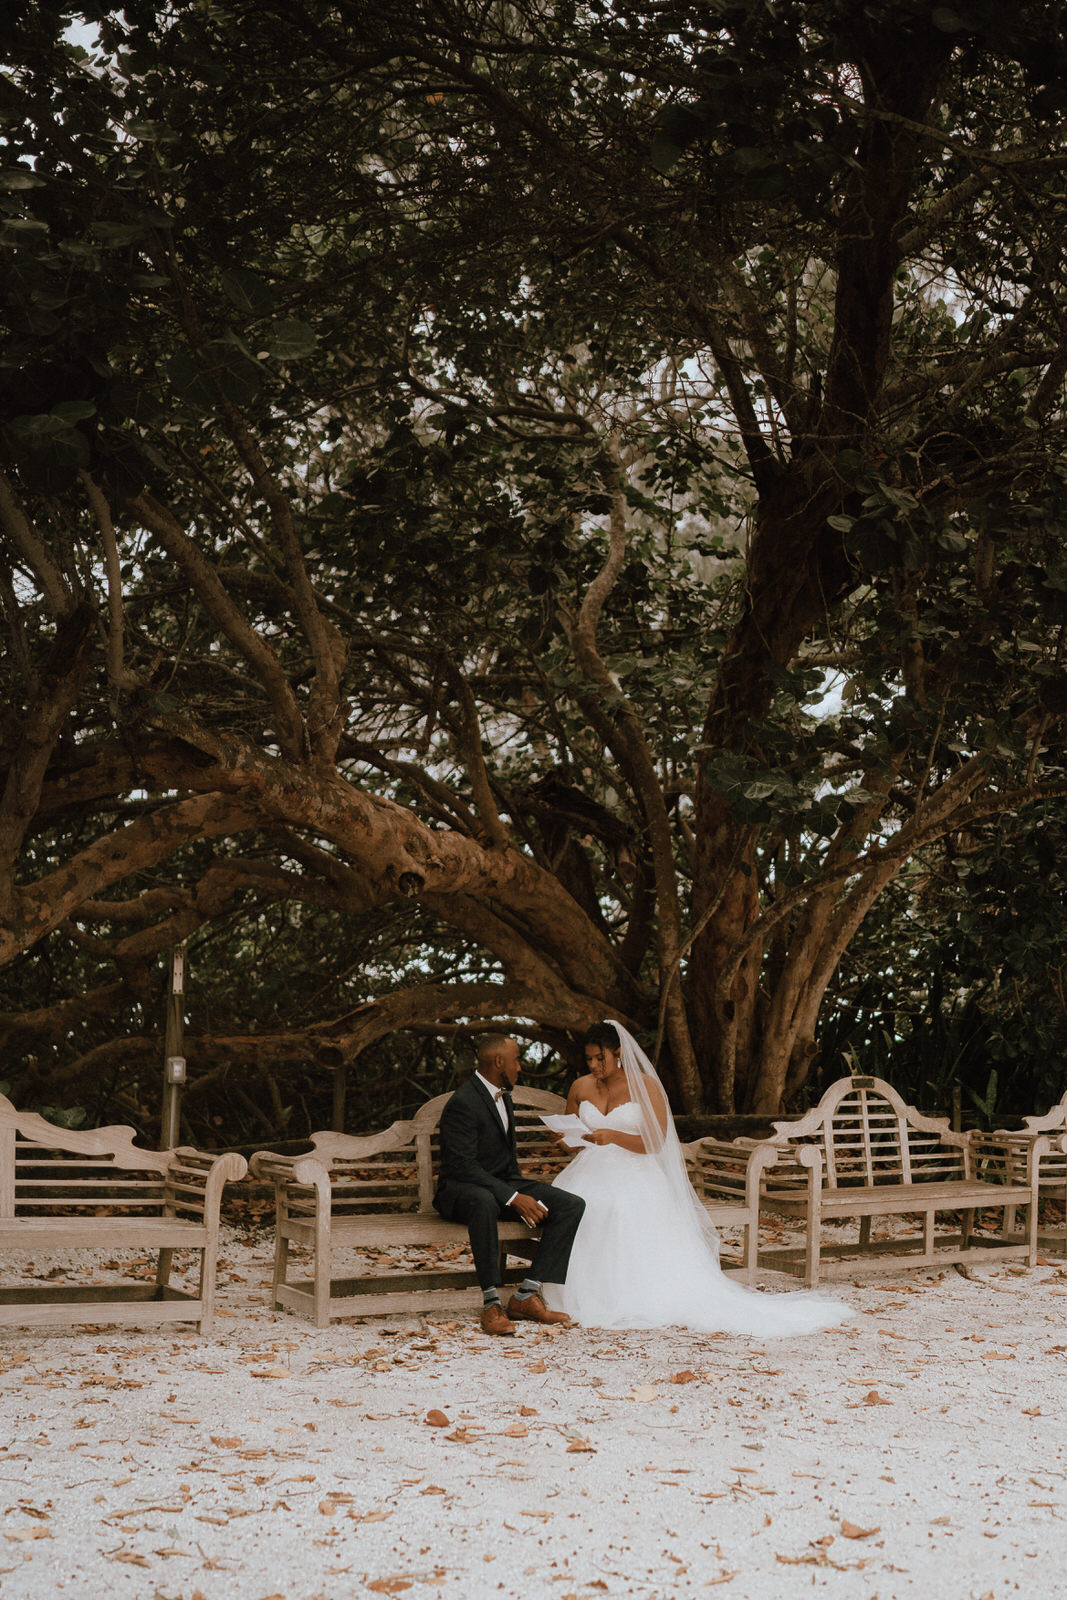 South Seas Island Resort Elopement- Alyana and Shawn- Michelle Gonzalez Photography-194.JPG